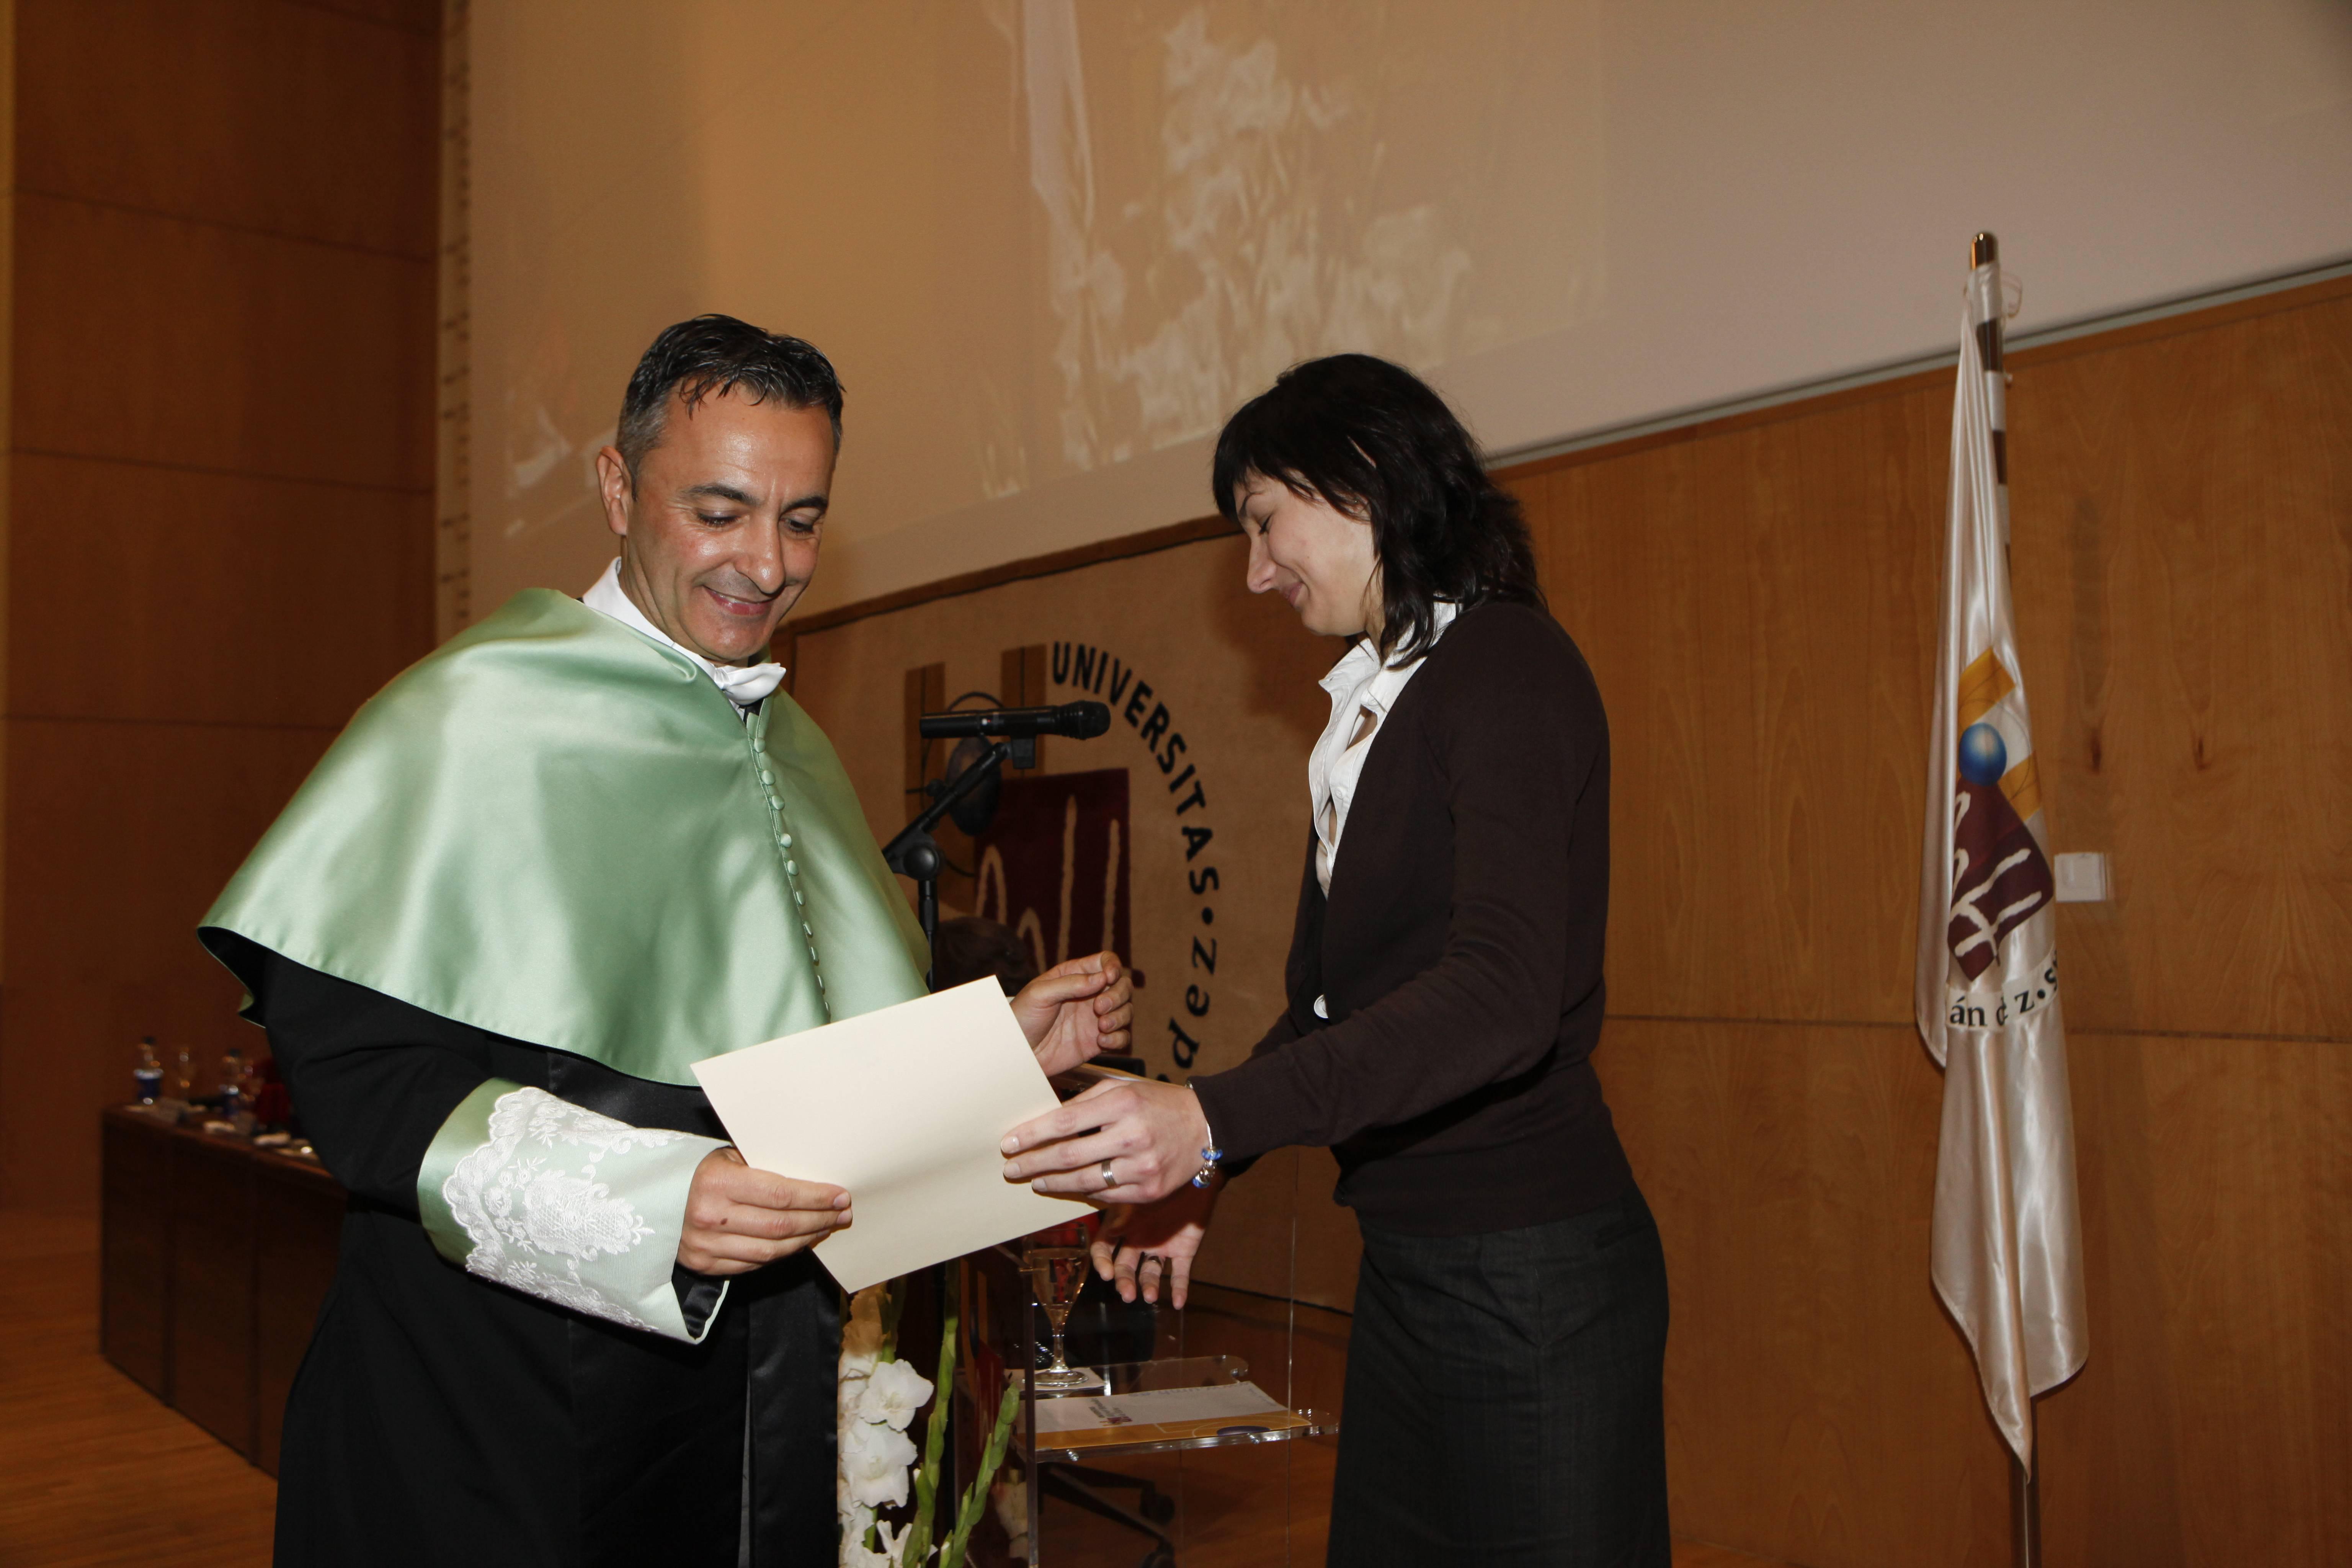 doctor-honoris-causa-luis-gamir_mg_0981.jpg